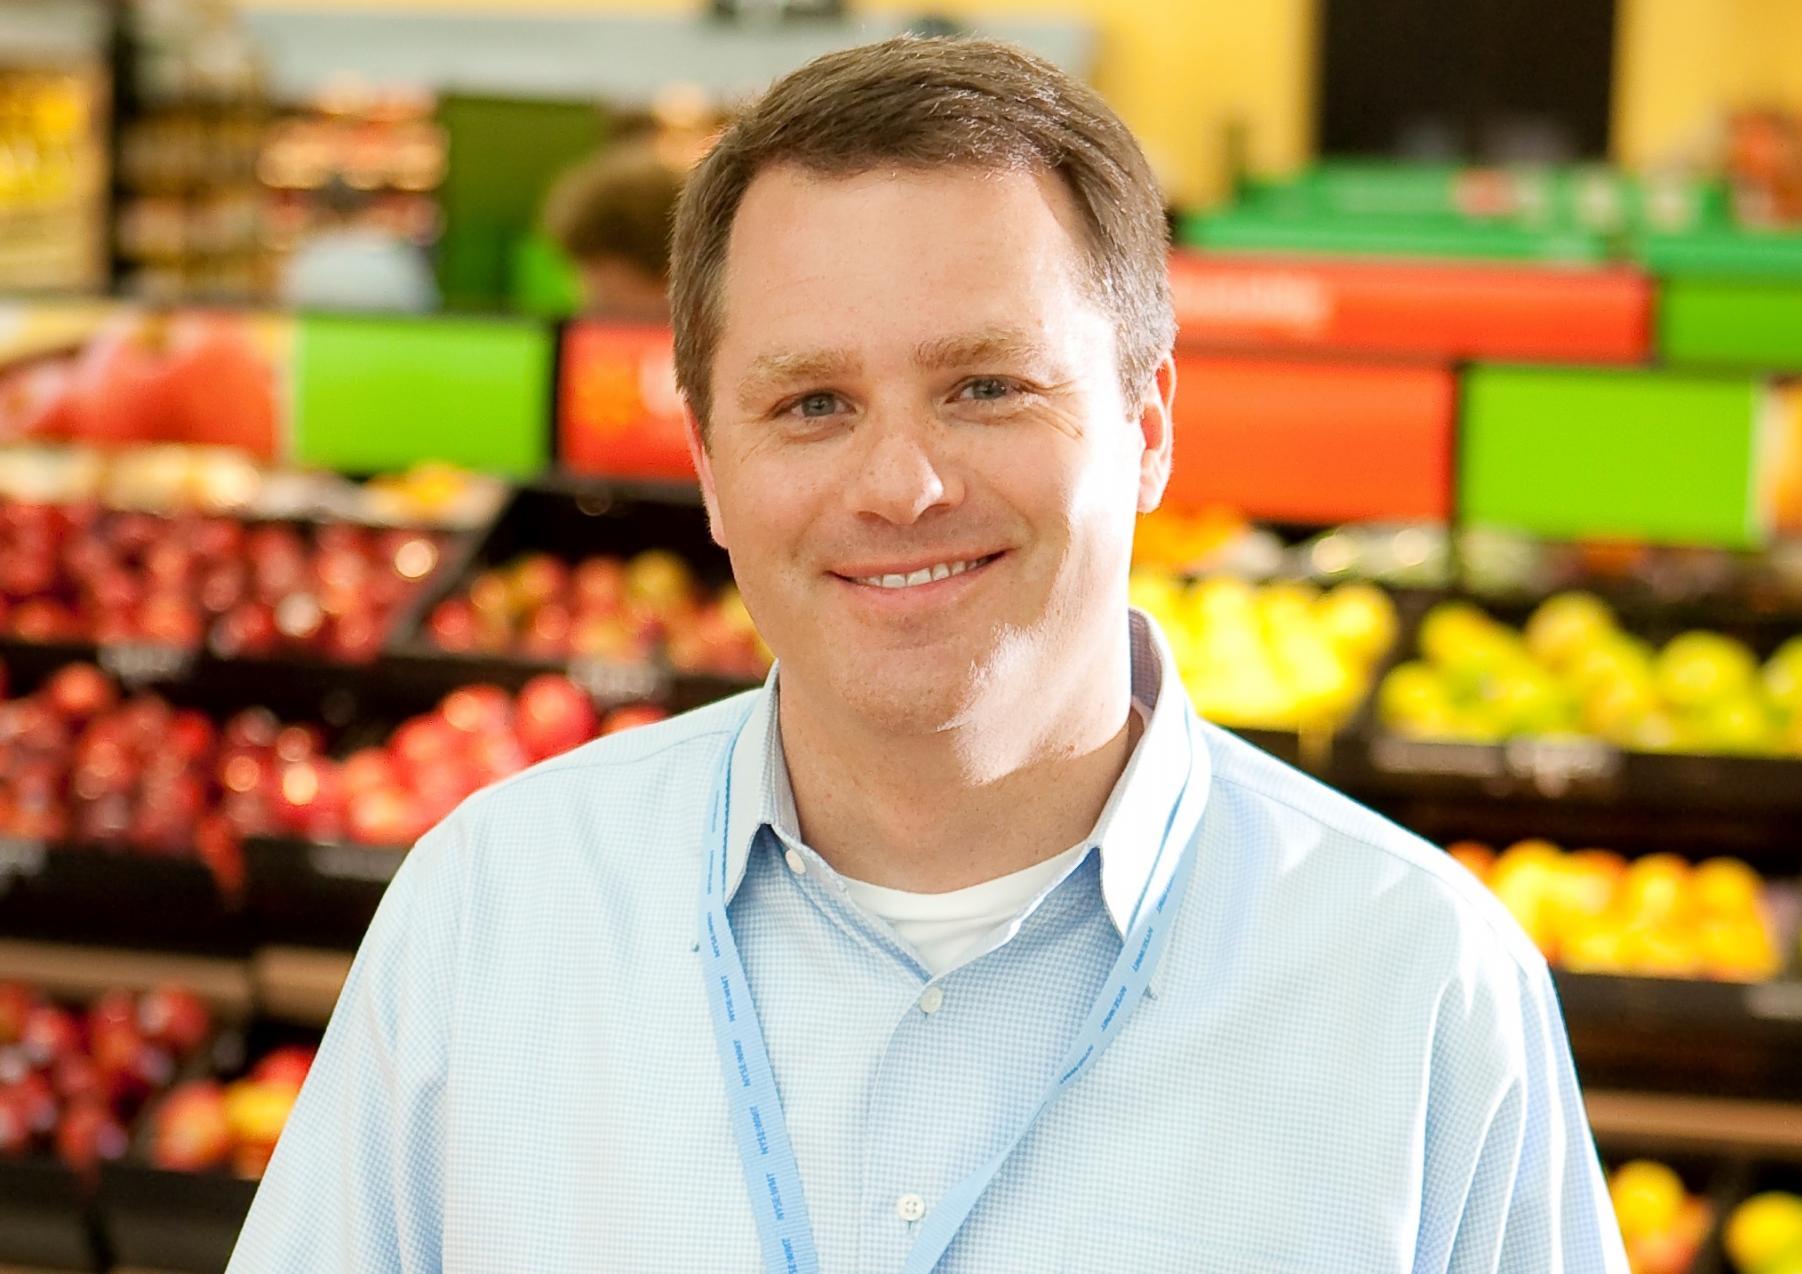 Walmart CEO Doug McMillon Pledges $100 Million to Address Racism